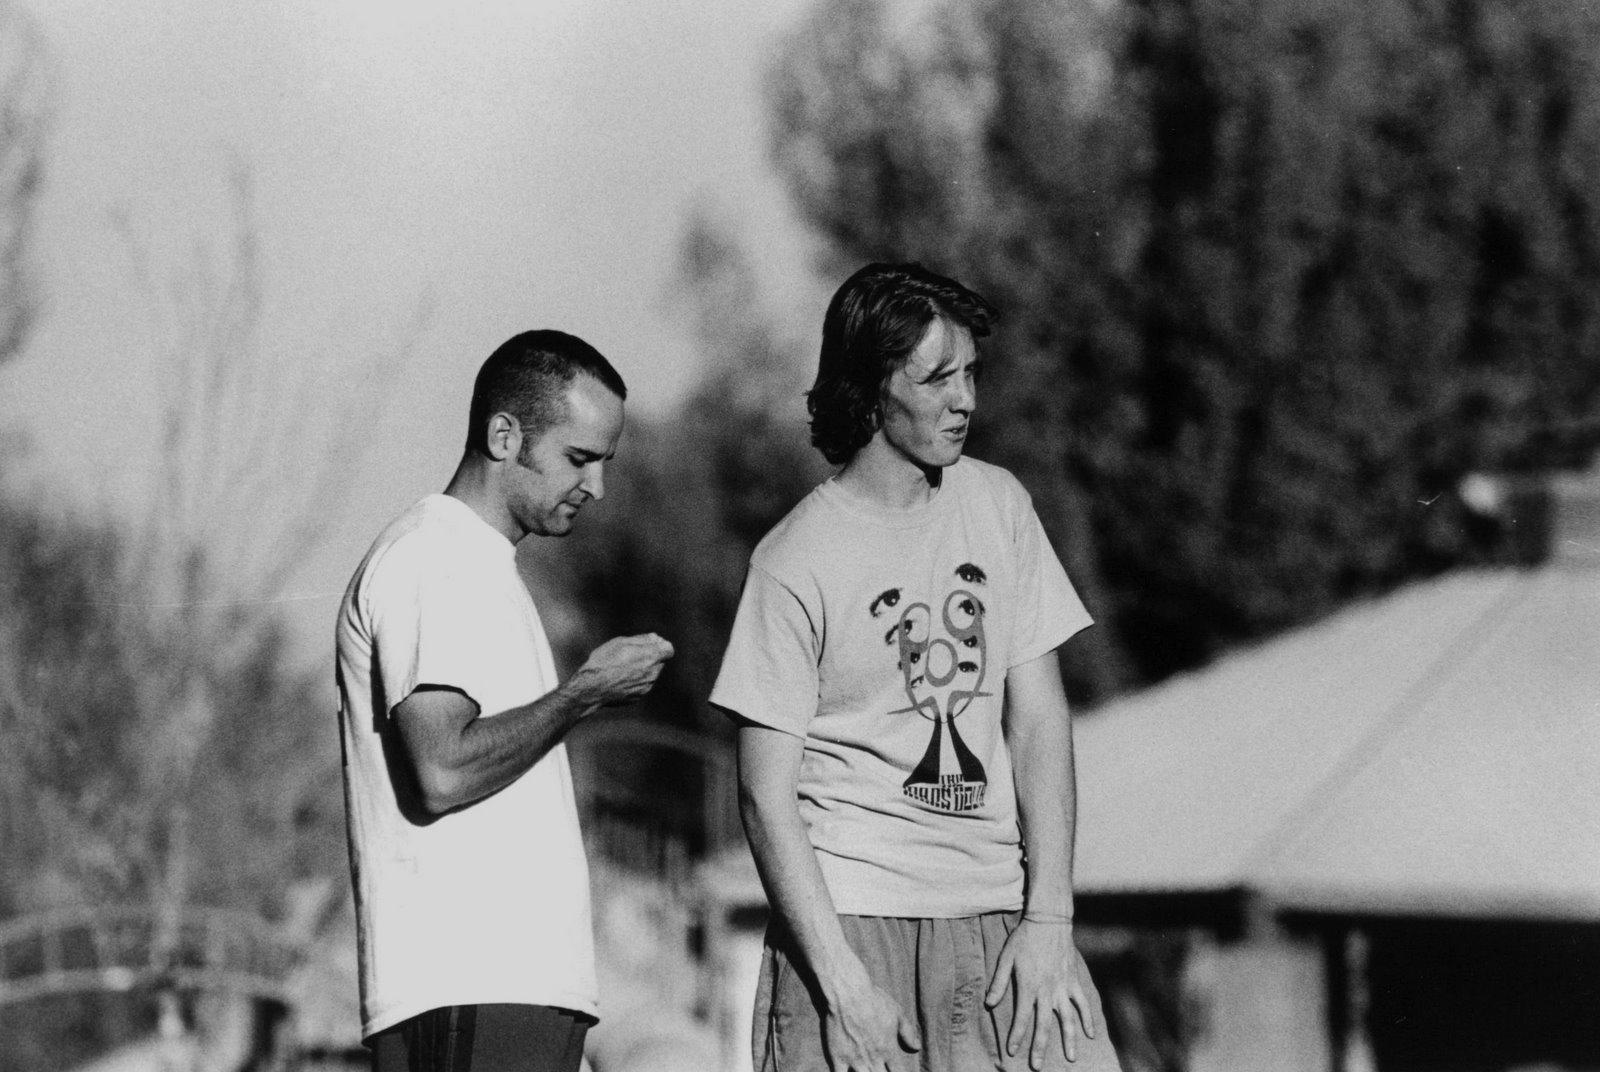 [Tom+and+Phil.jpg]